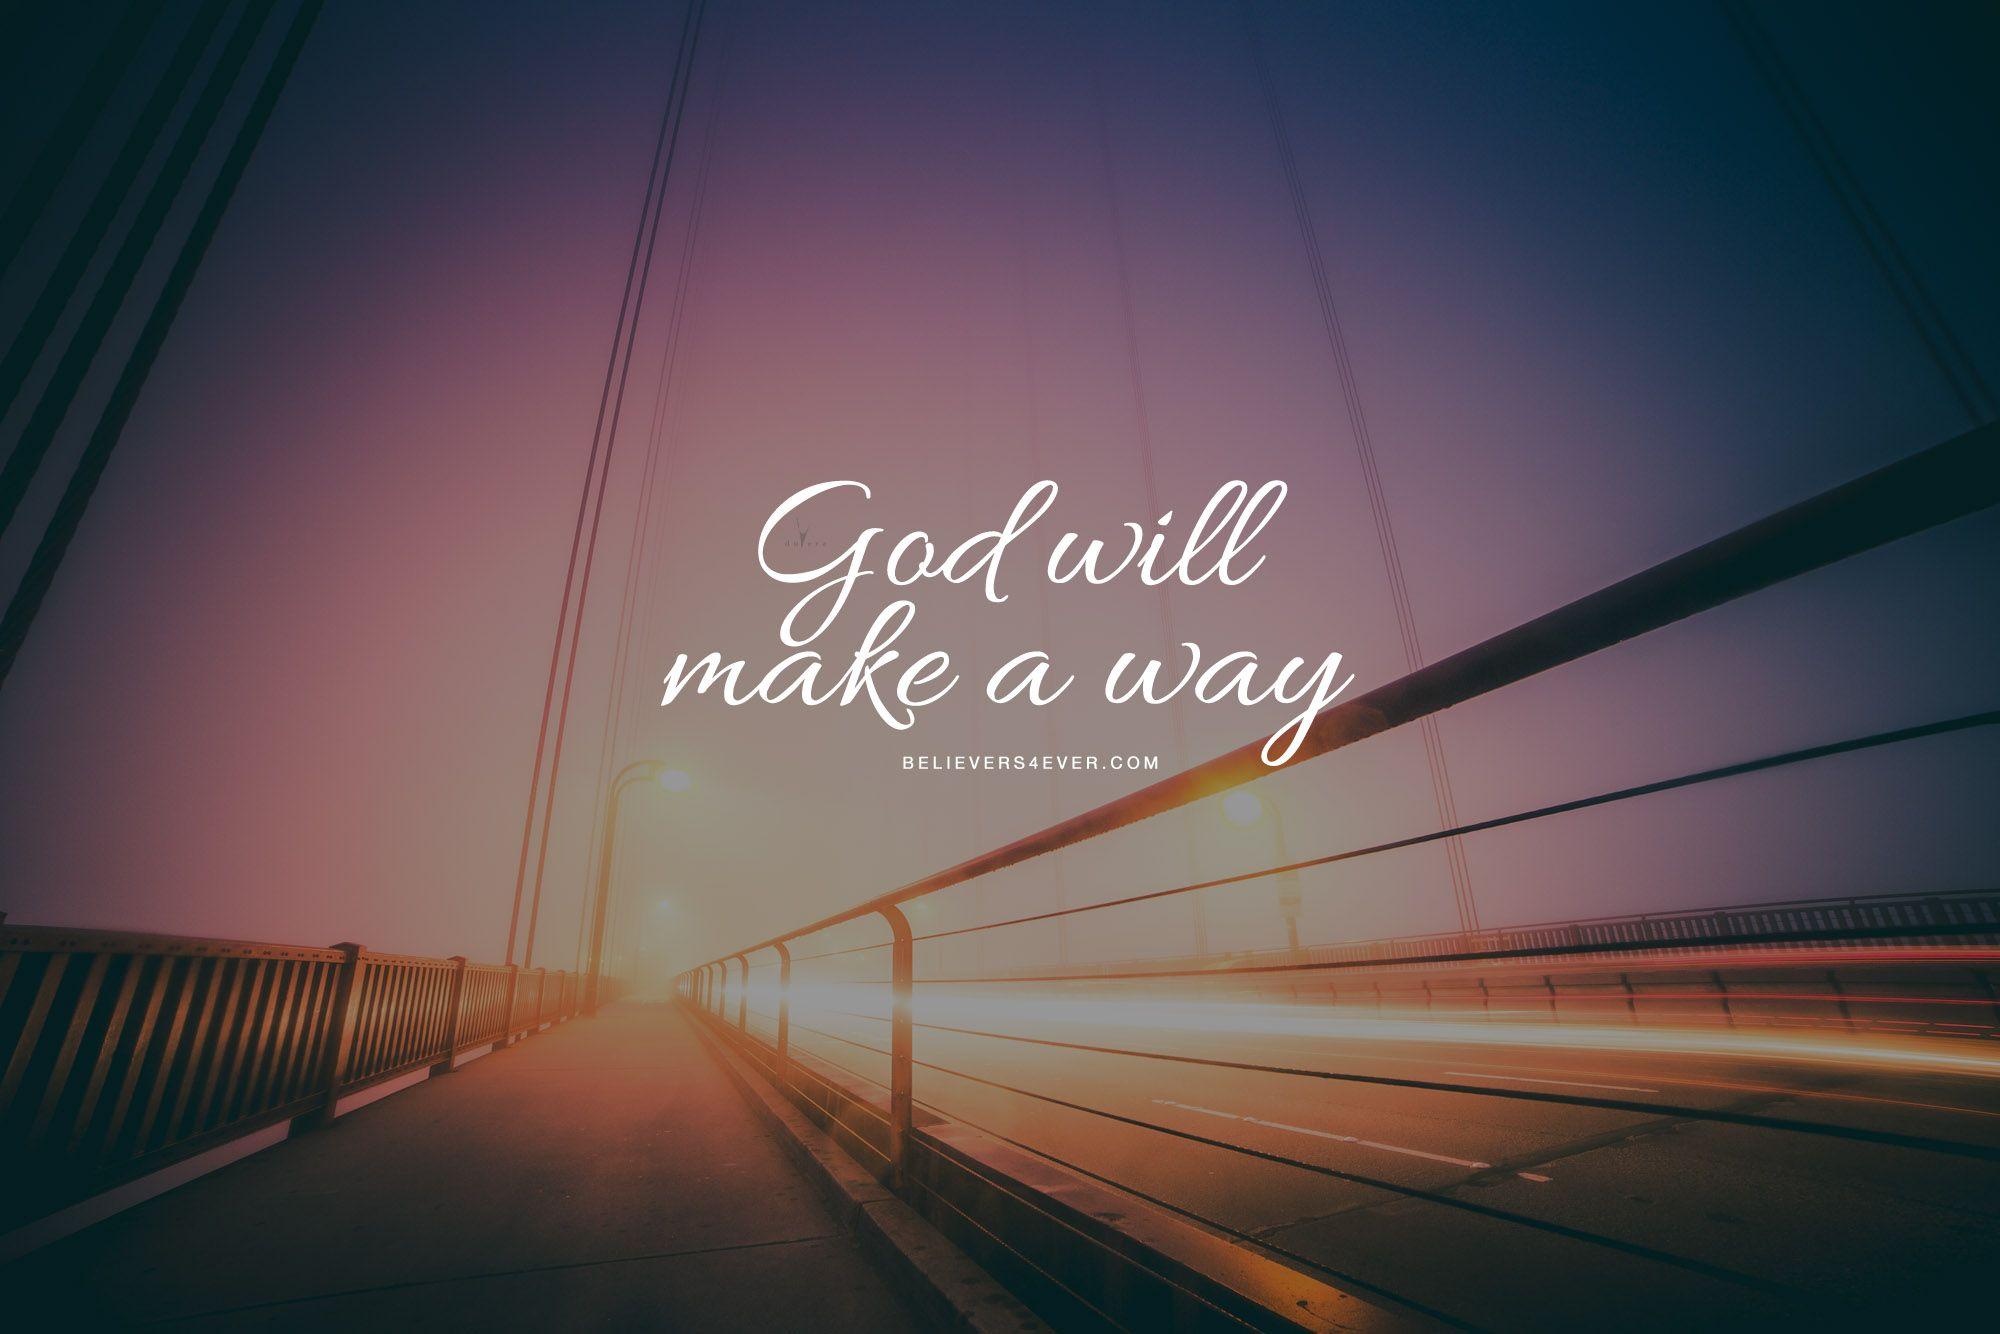 God will make a way | Christian quotes | Scripture wallpaper, Wallpaper bible, Inspirational ...